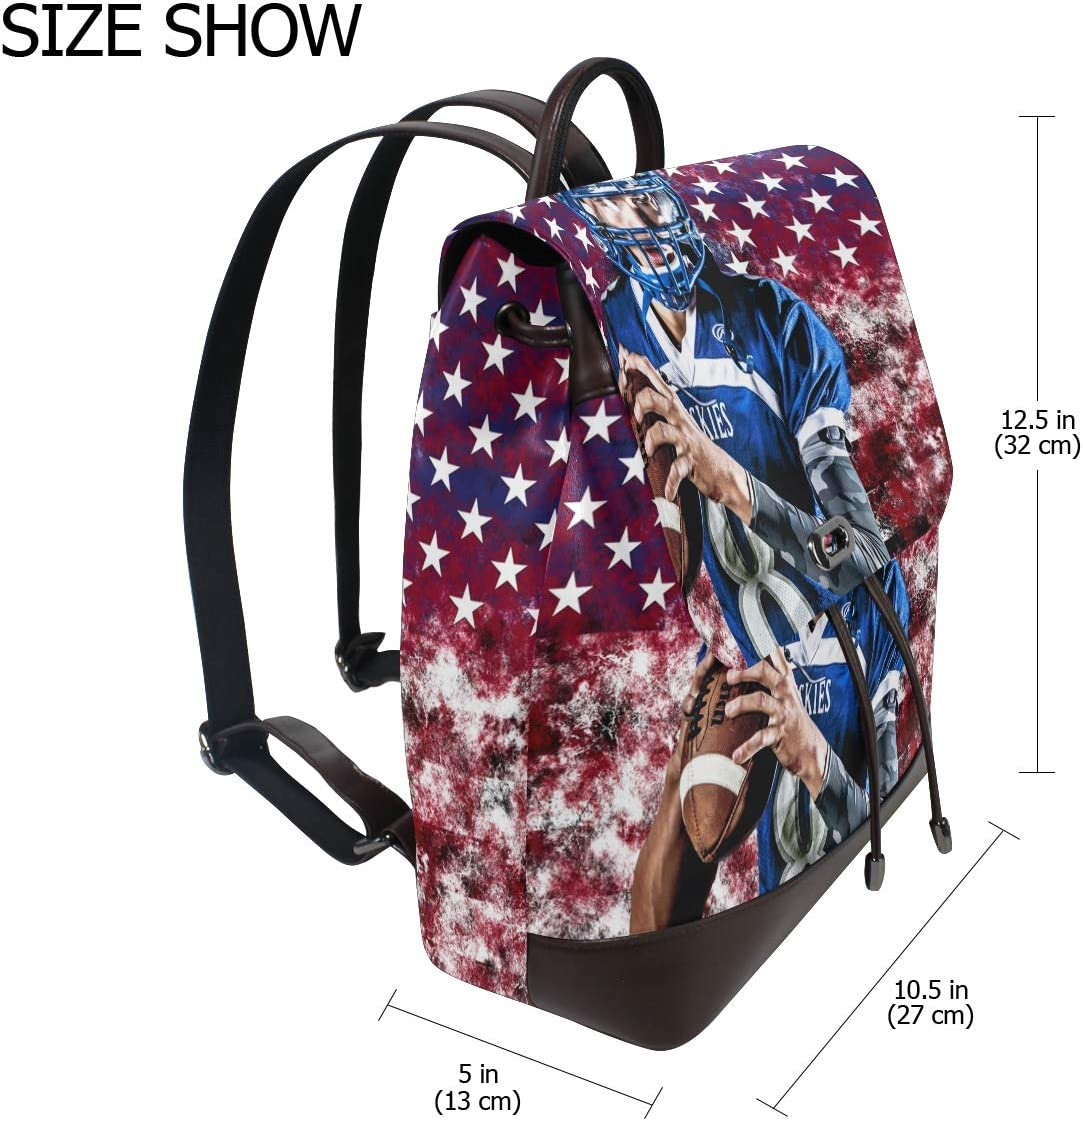 School Bag Storage Bag For Men Women Girls Boys Personalized Pattern Rugby Game Shopping Bag Backpack Travel Bag